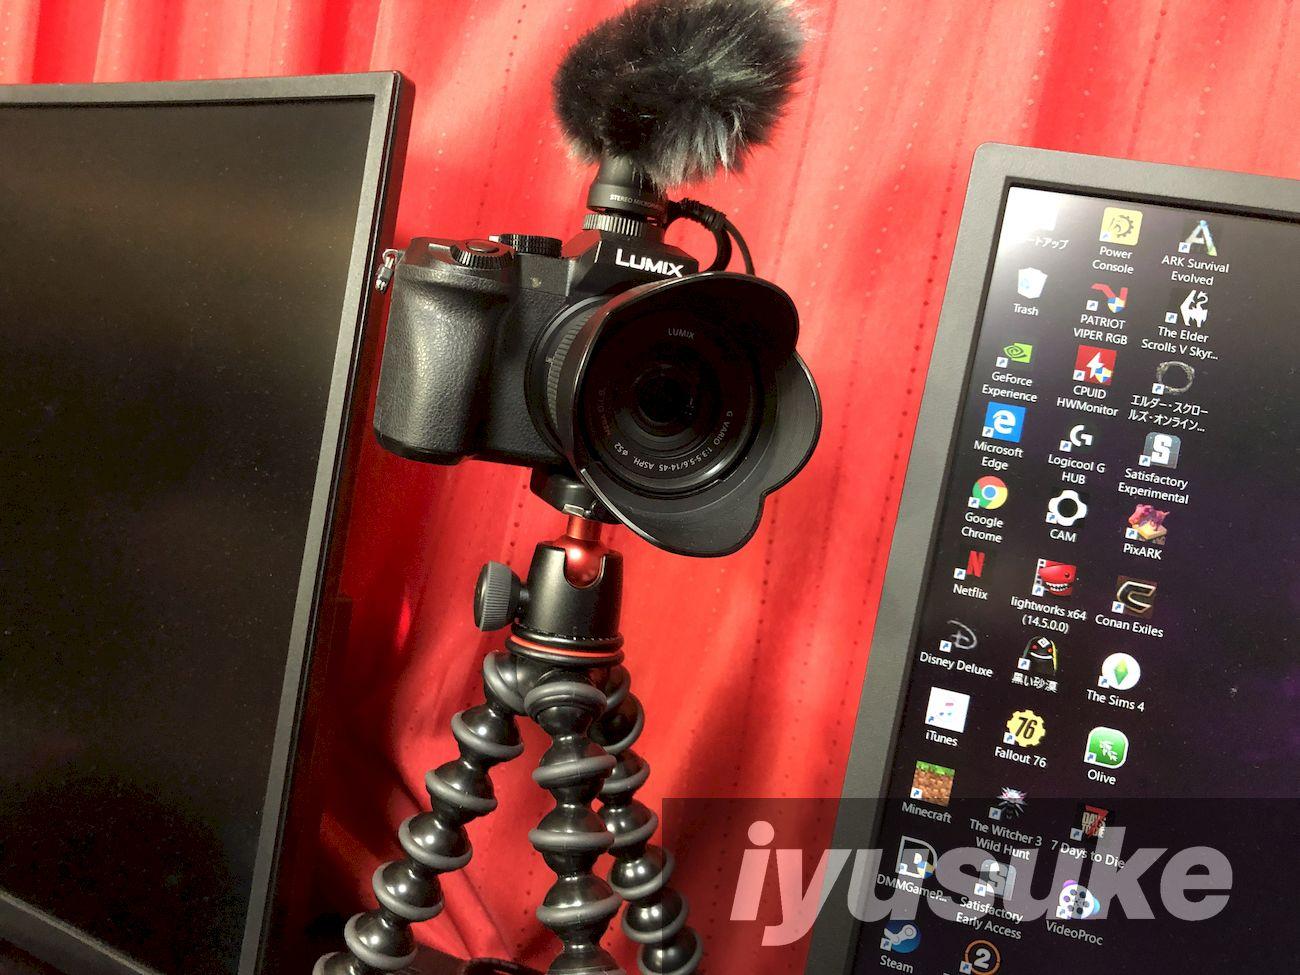 videoproc-letsplay-5